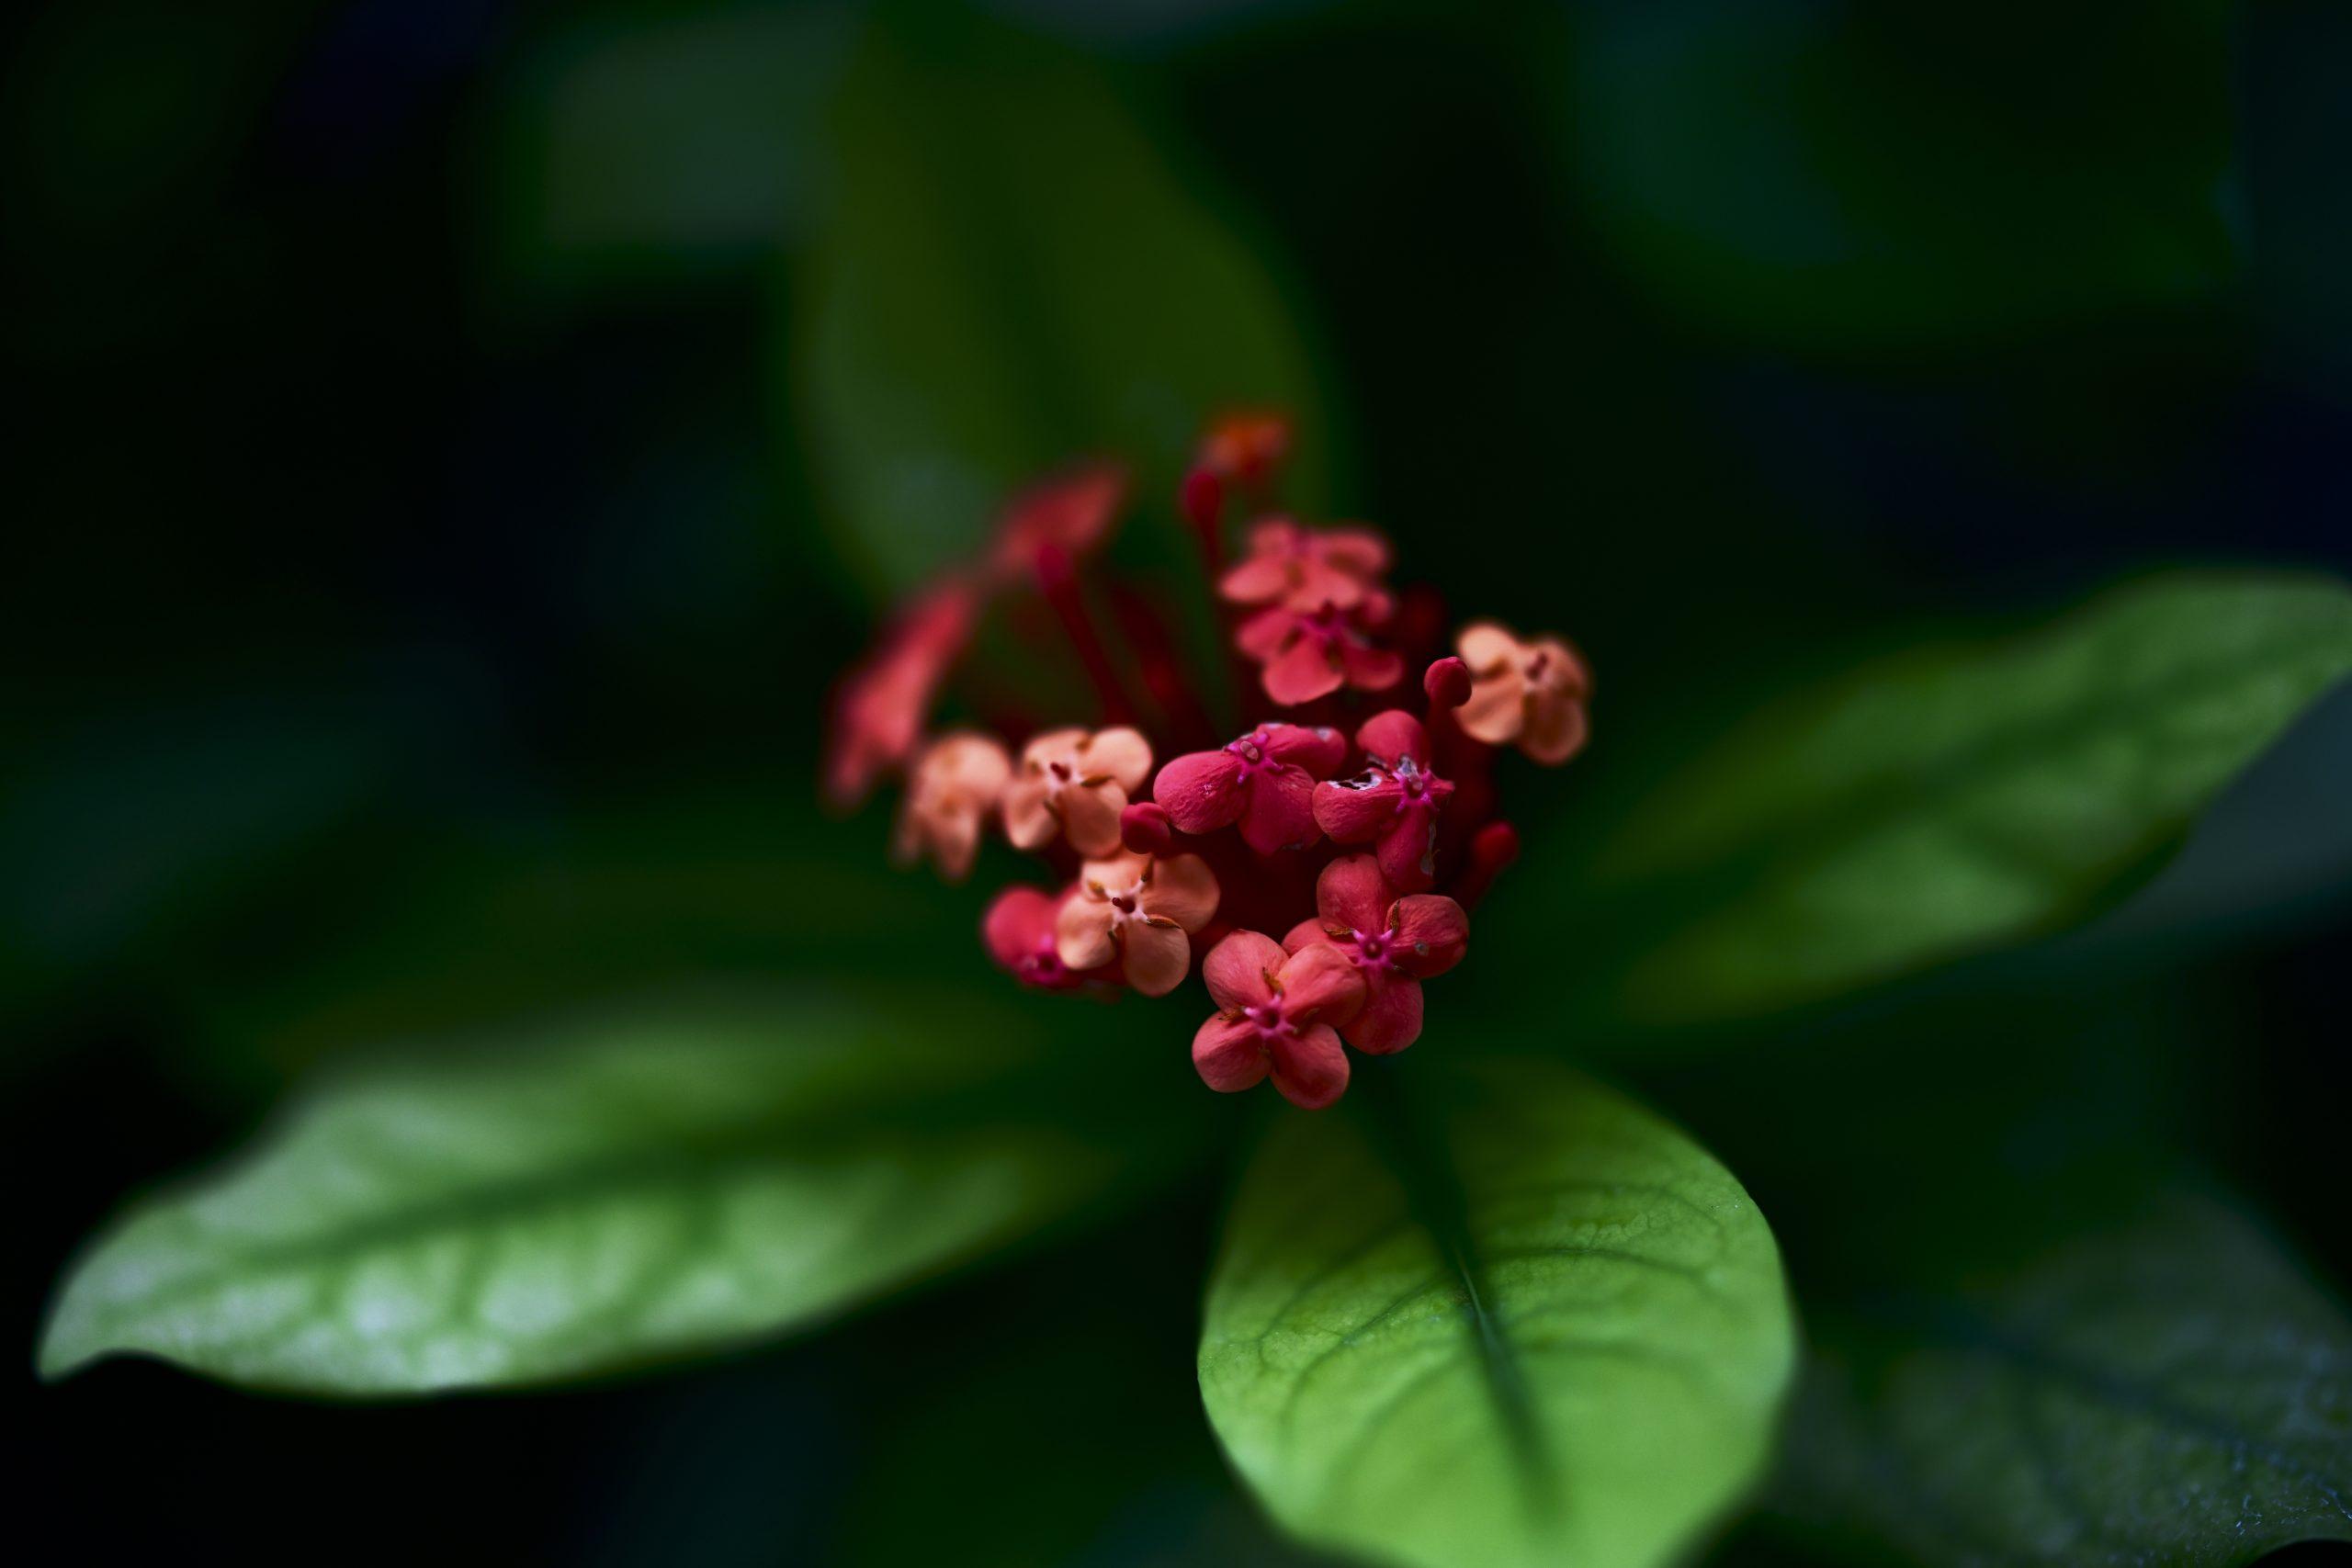 【Nikon】Z7II×Z58mm F0.95 S Noct 魅惑の植物撮影